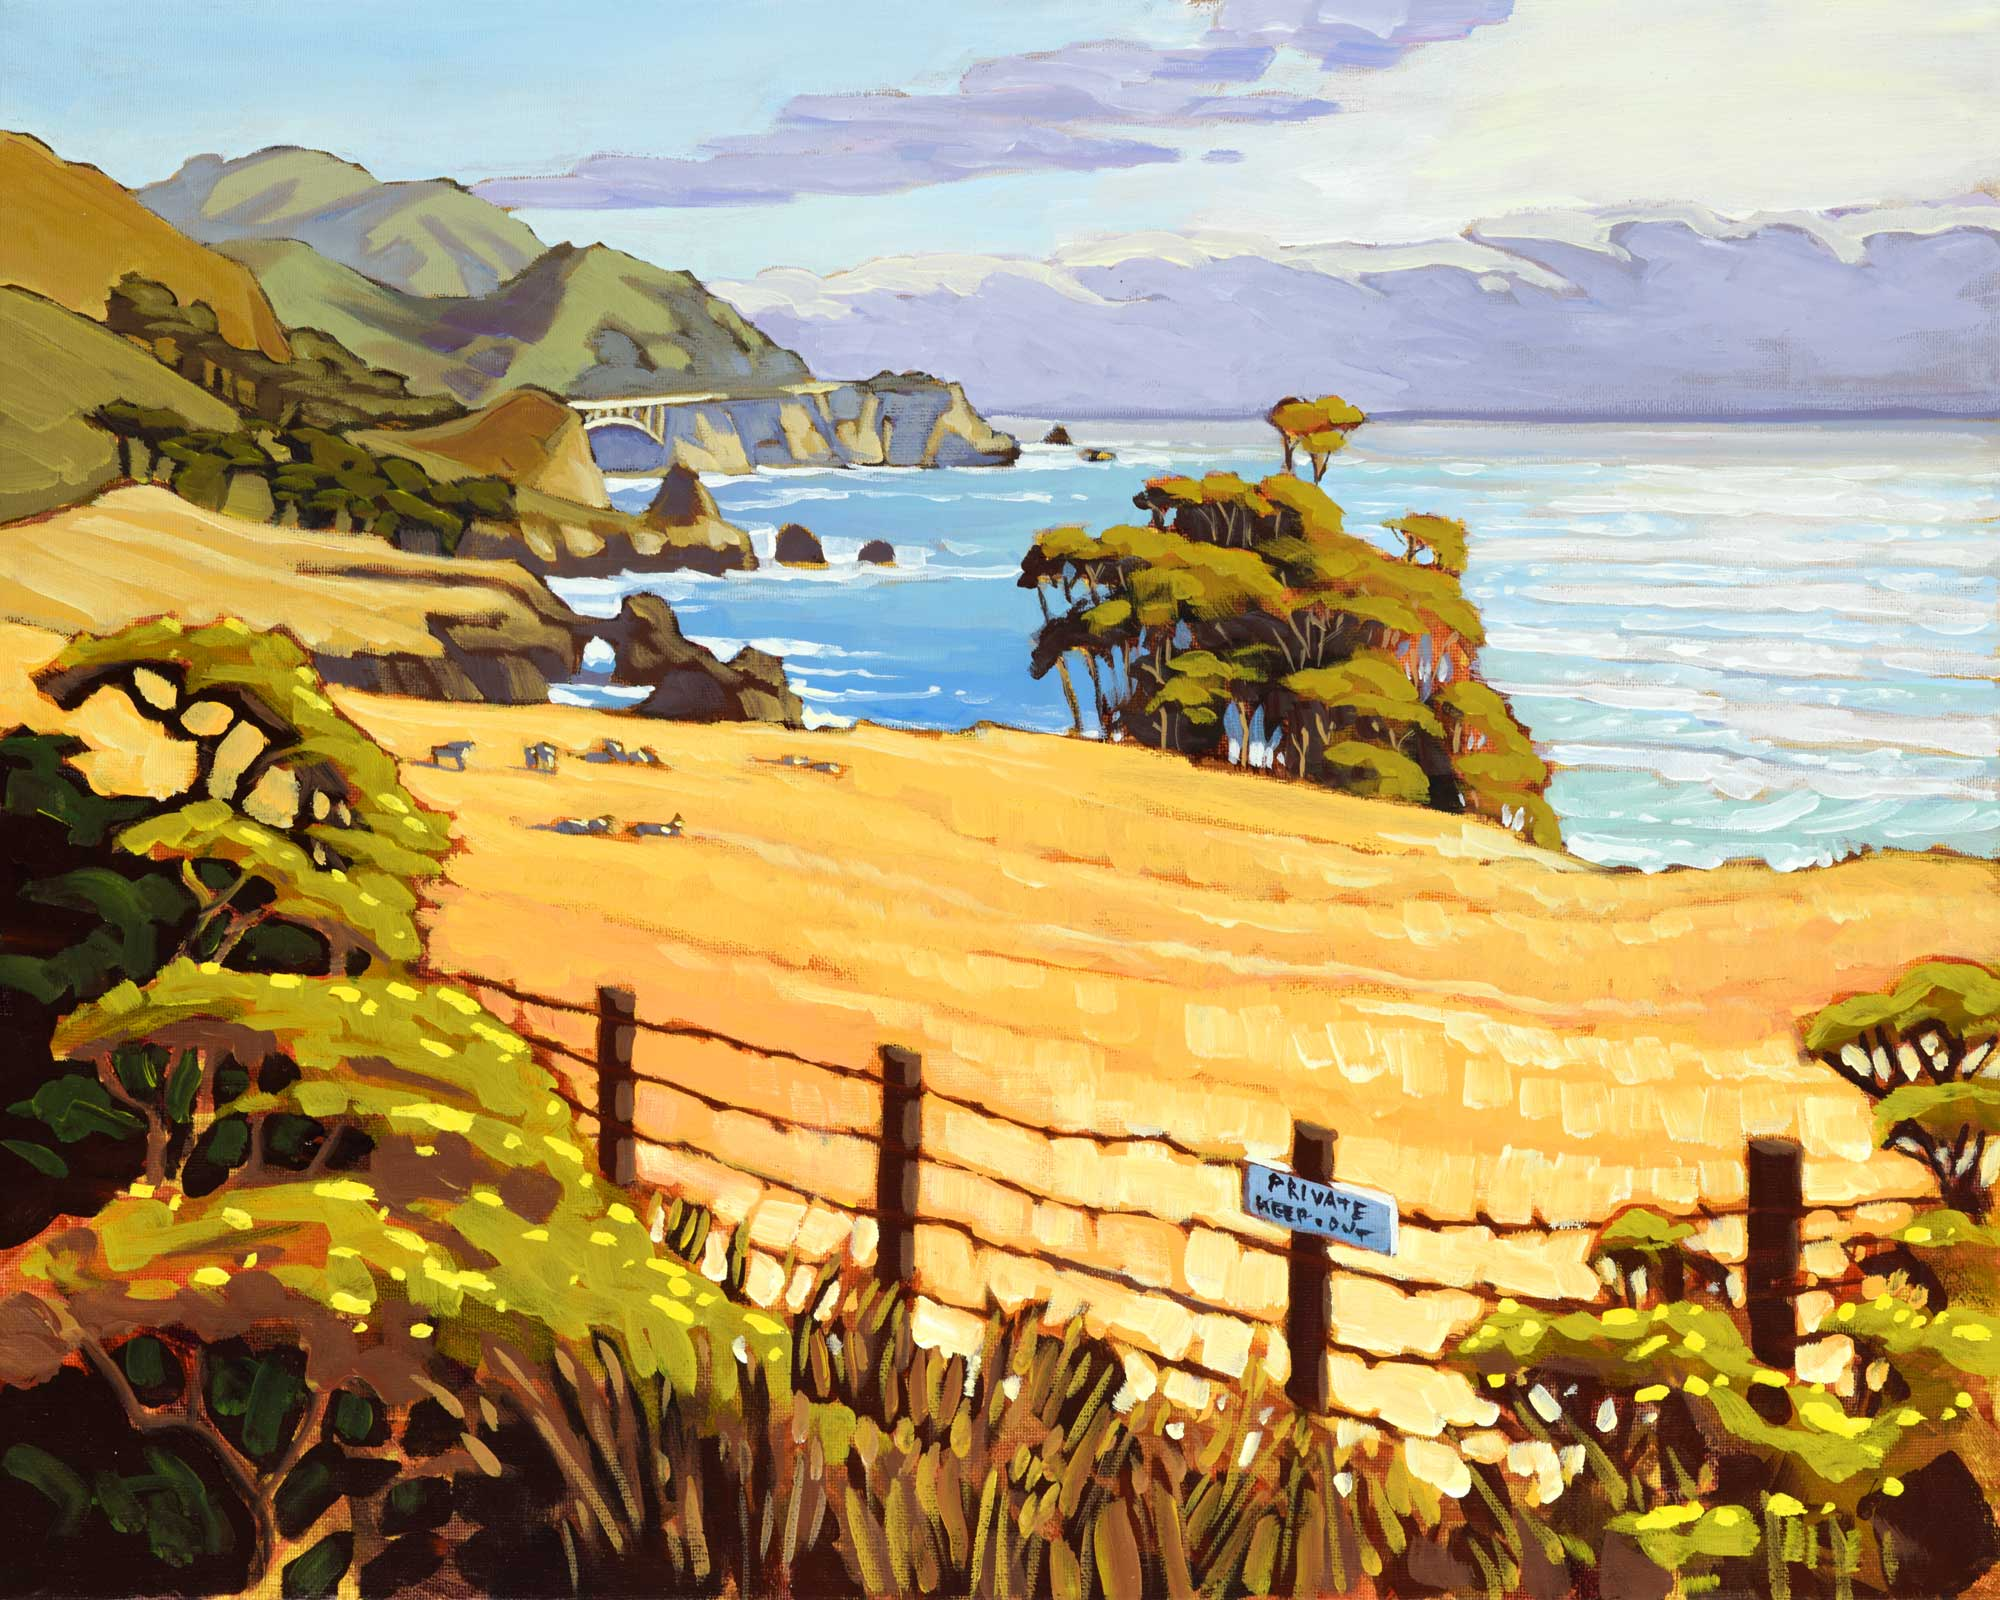 California coastal plein air artwork of Rocky Creek Bridge on the Big Sur coast of Montery county